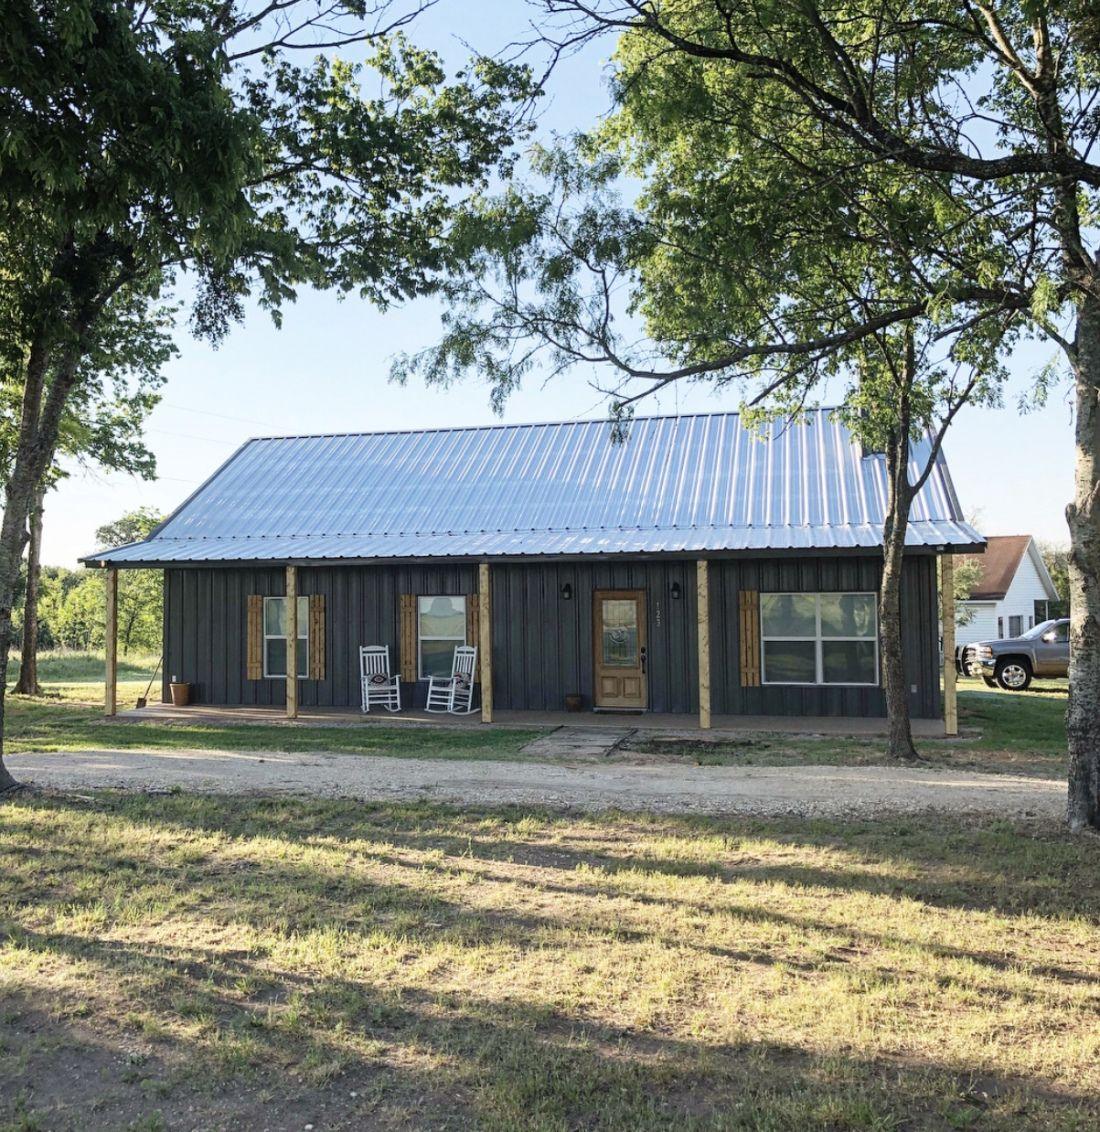 Barndominium Budget Hunt Farmhouse In 2020 Pole Barn House Plans Barn House Plans House Plans Farmhouse